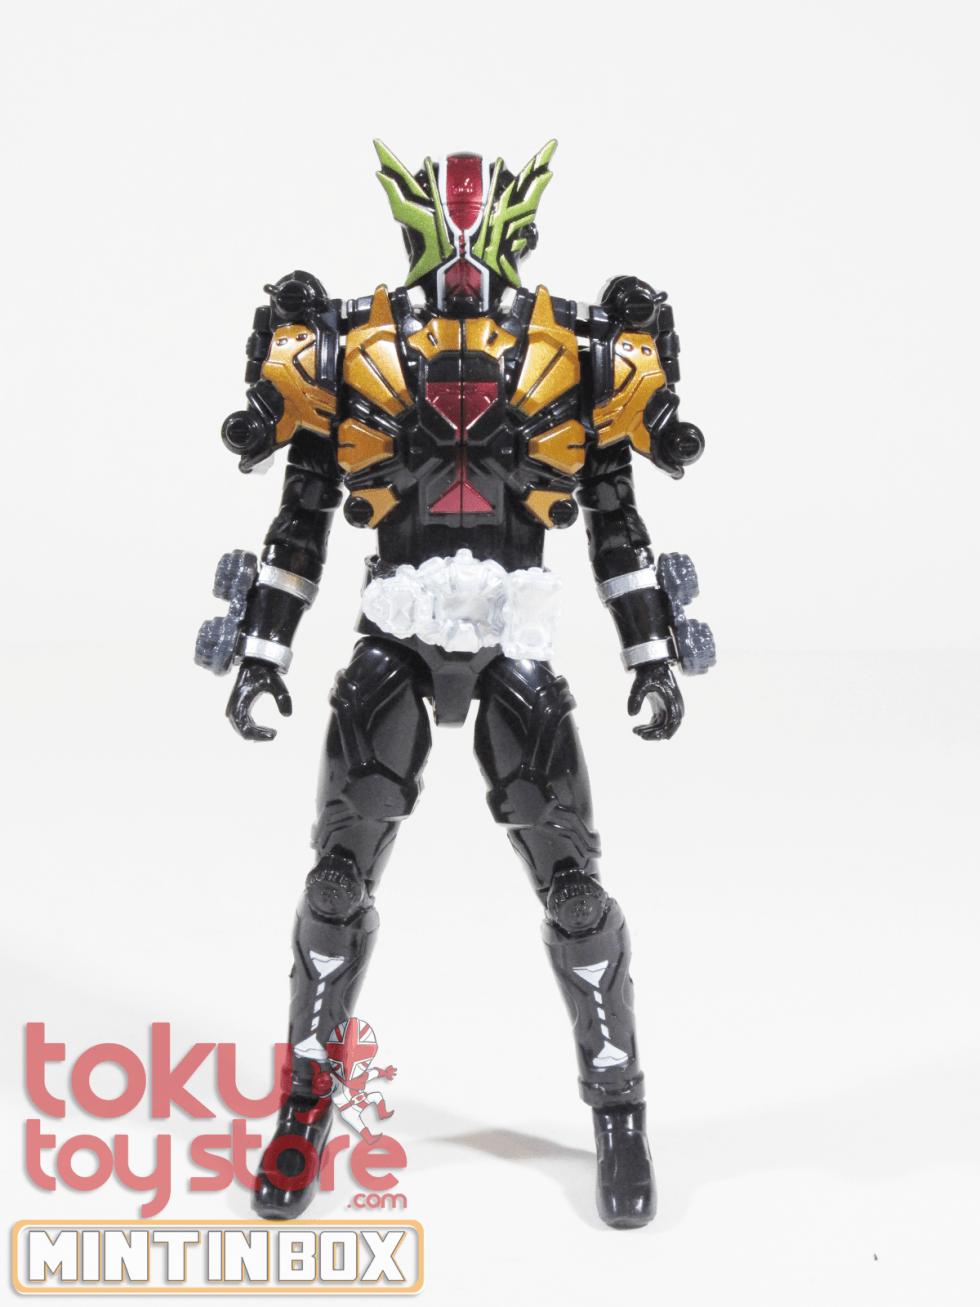 RKF_Geiz Revive_Toku Toy Store (3)